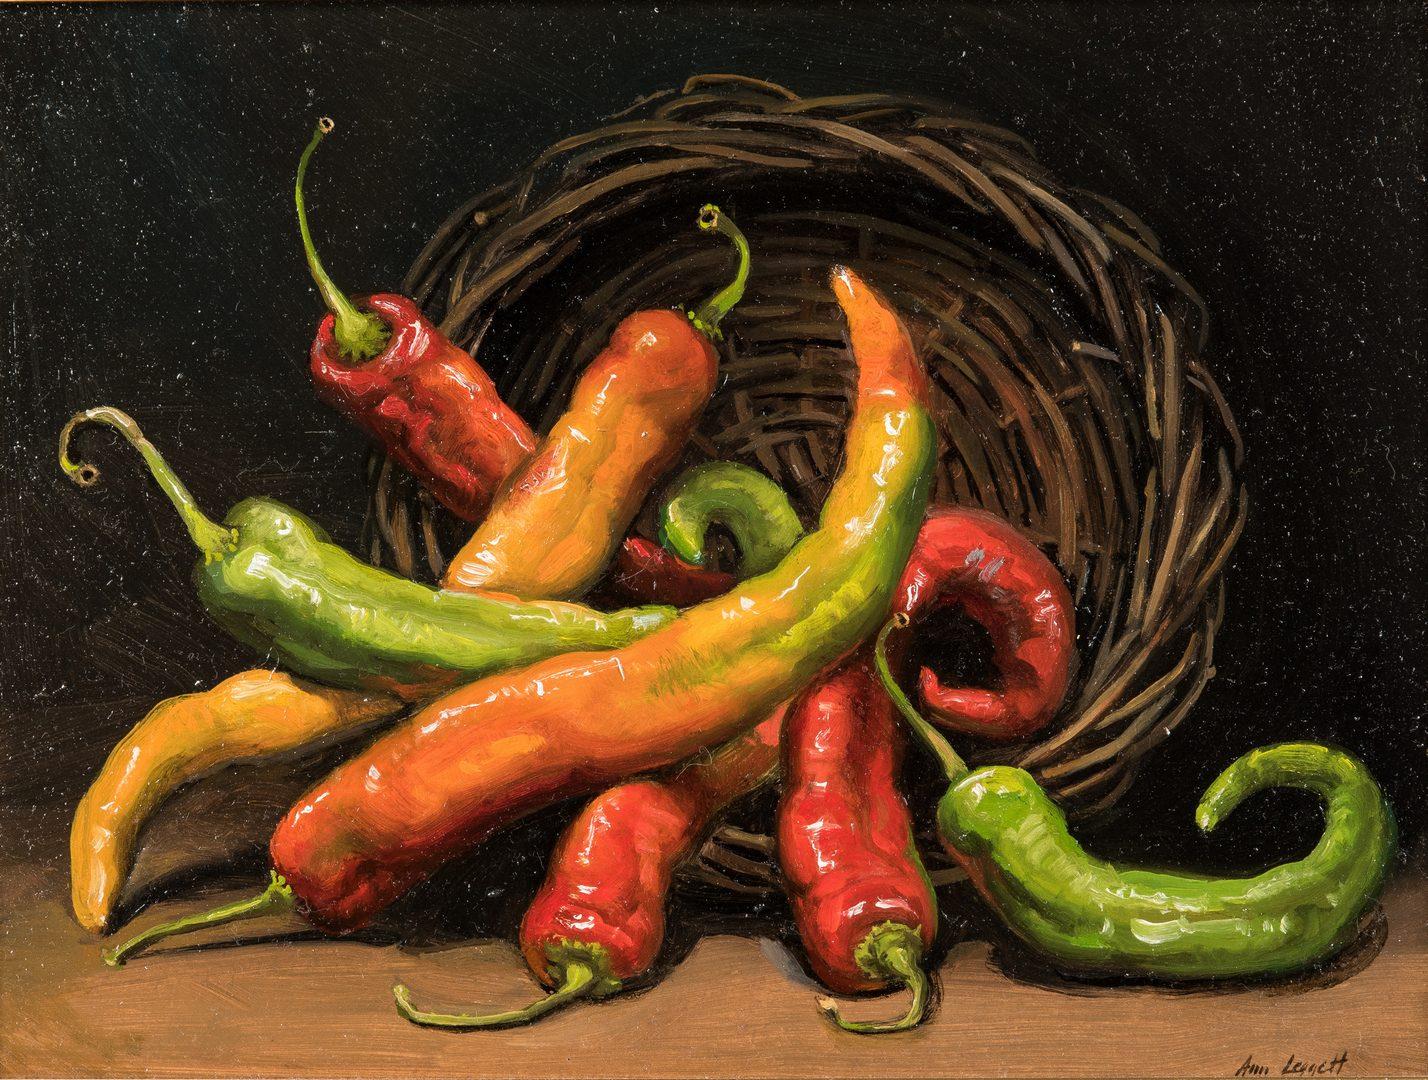 Lot 724: Ann Leggett O/B, Chili Pepper Still Life Painting